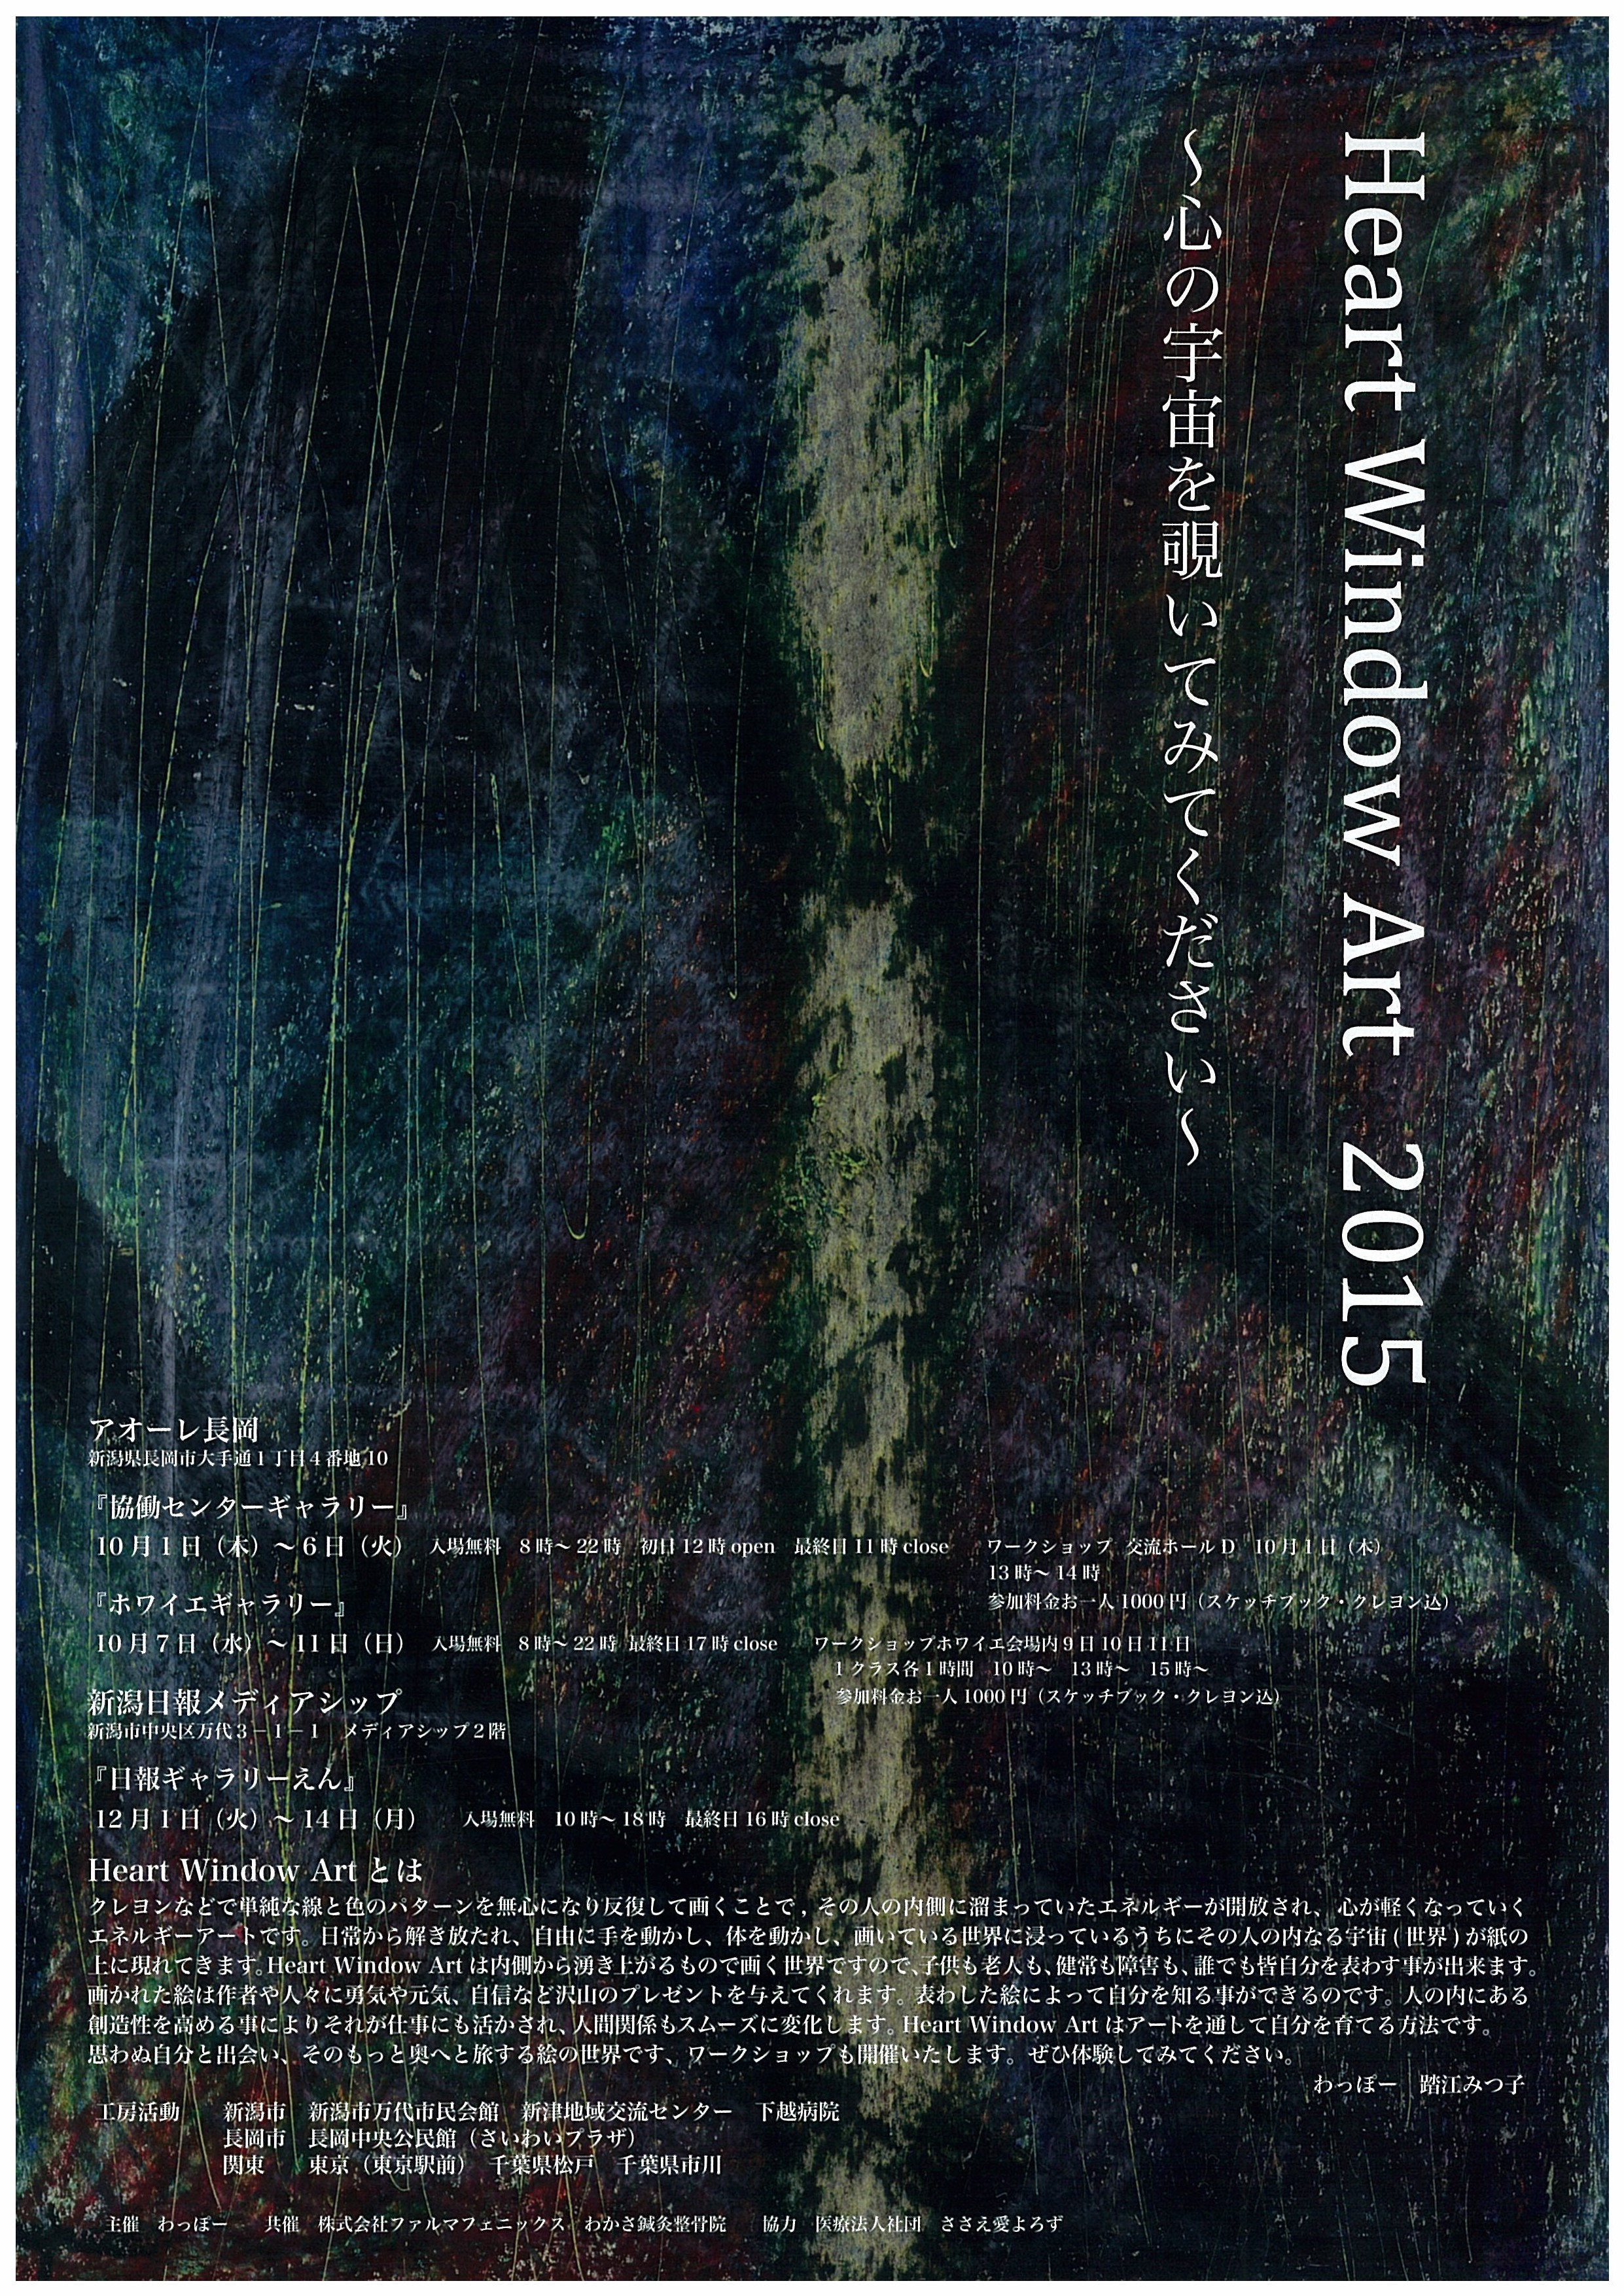 http://mitsuko-fumie.com/wp-content/uploads/2015/07/scan-001.jpg